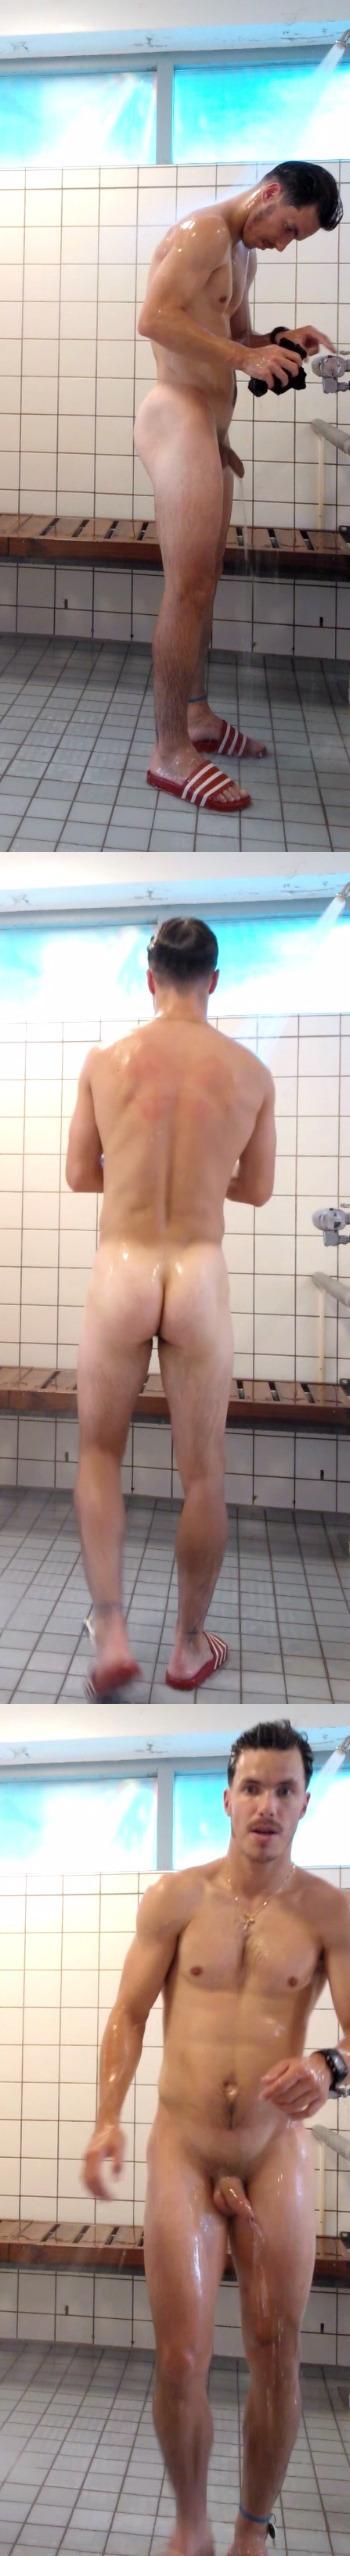 naked uncut guy in gym shower room